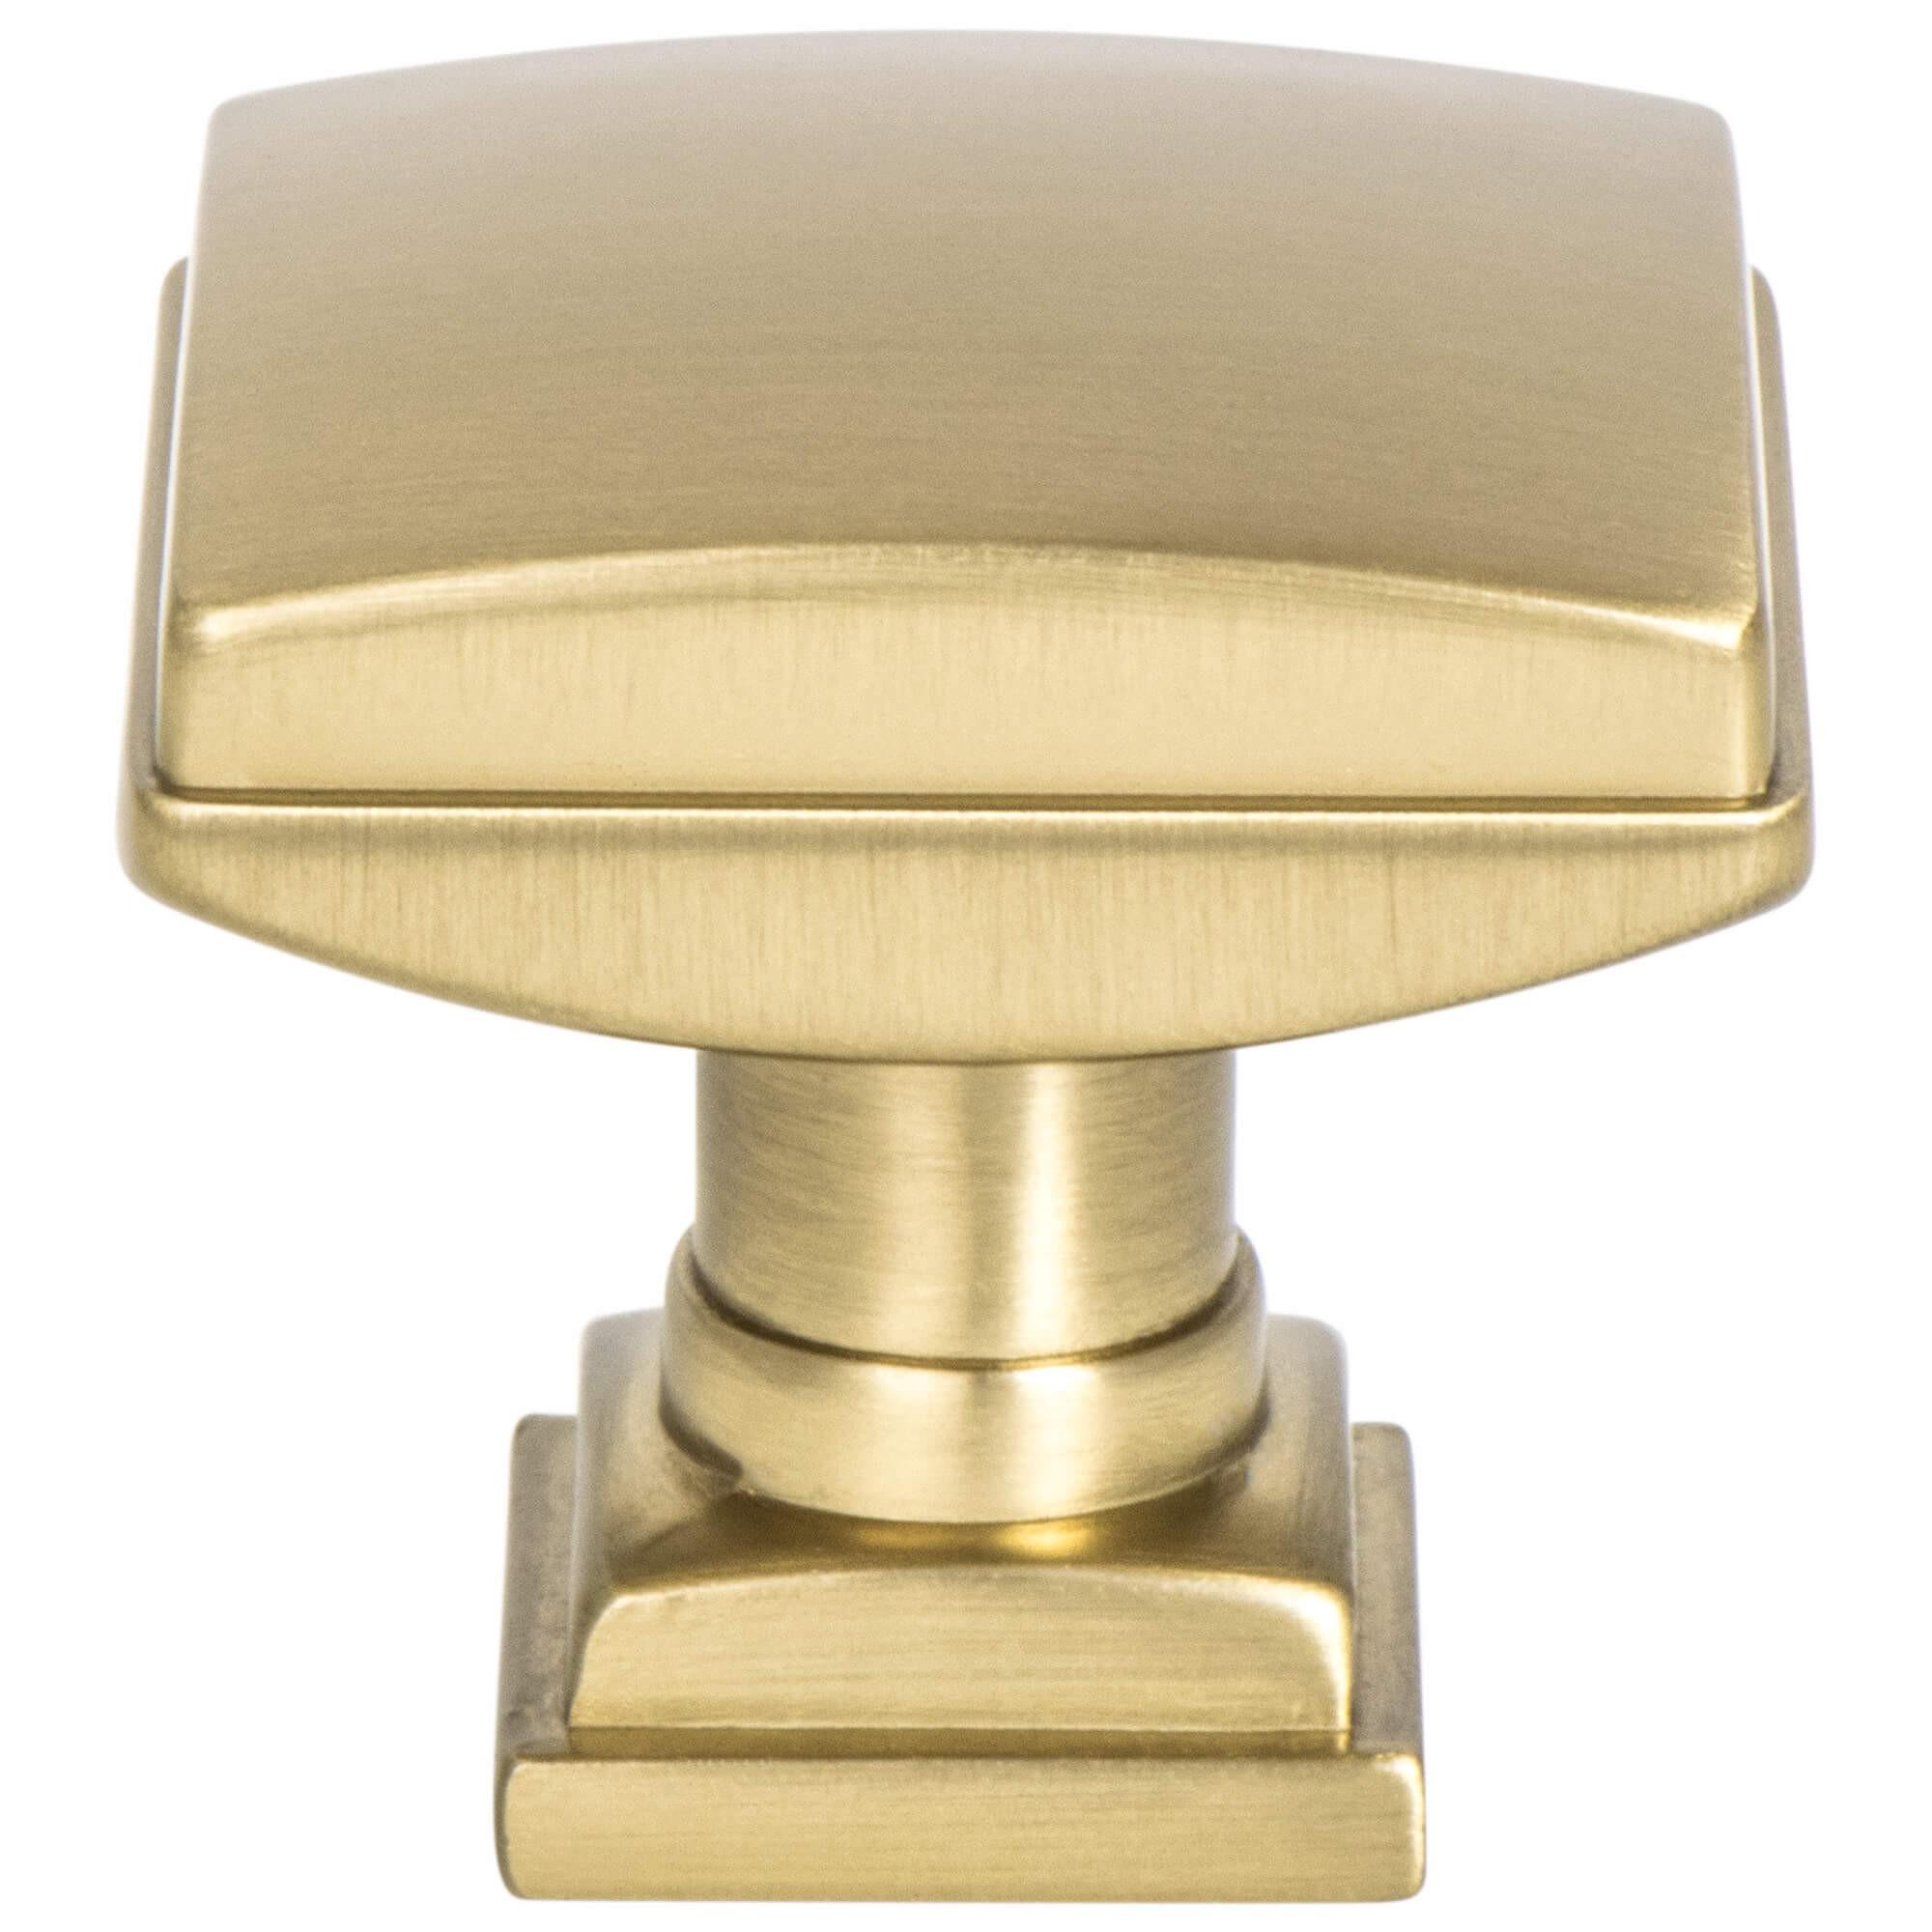 Knob (Modern Brushed Gold)